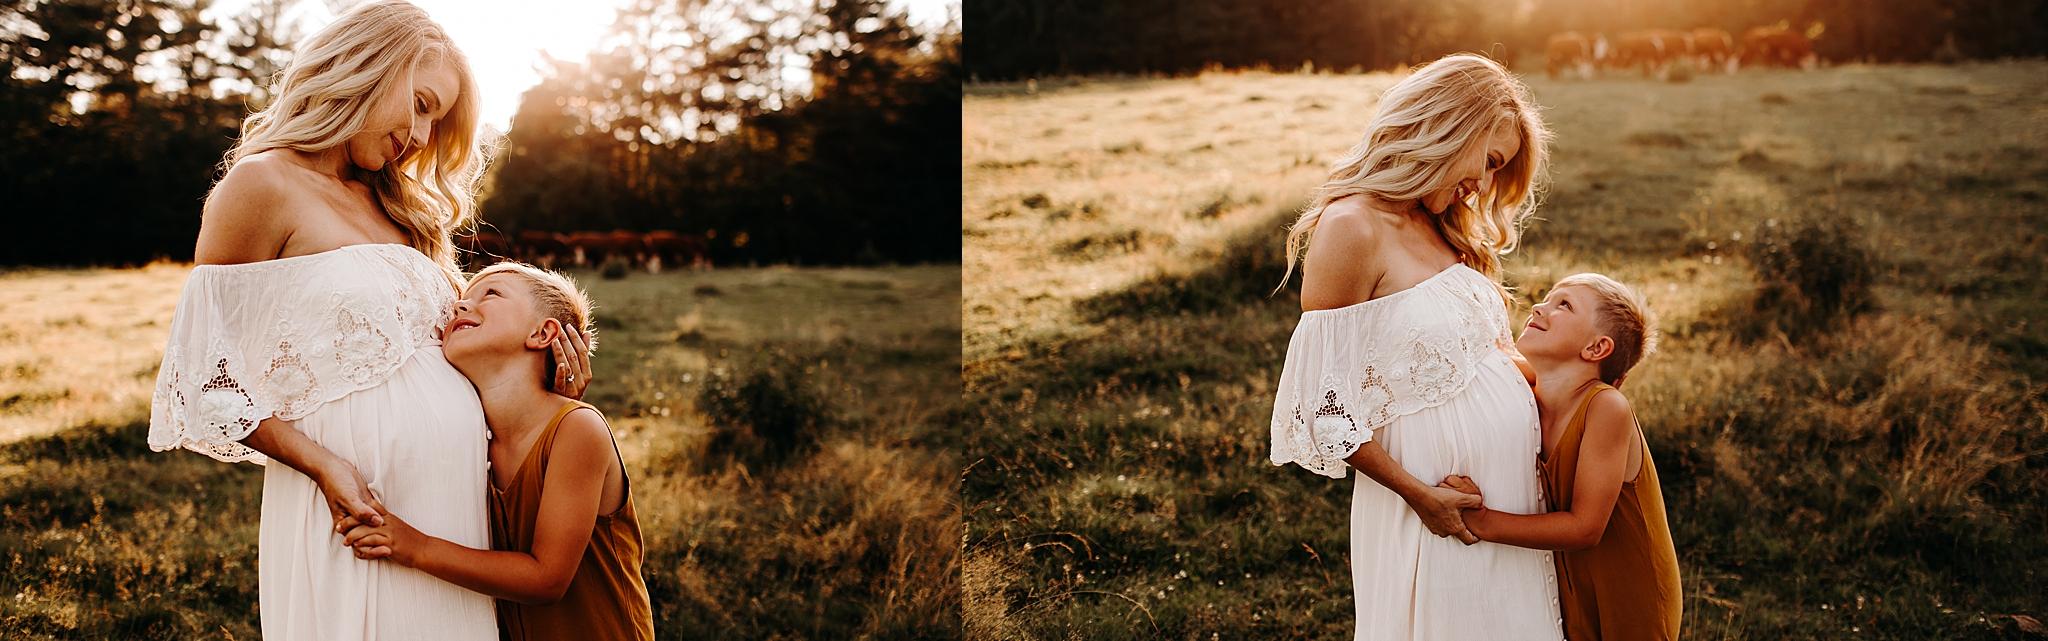 Emily-San-Antonio-Family-Photographer00031_WEB.jpg